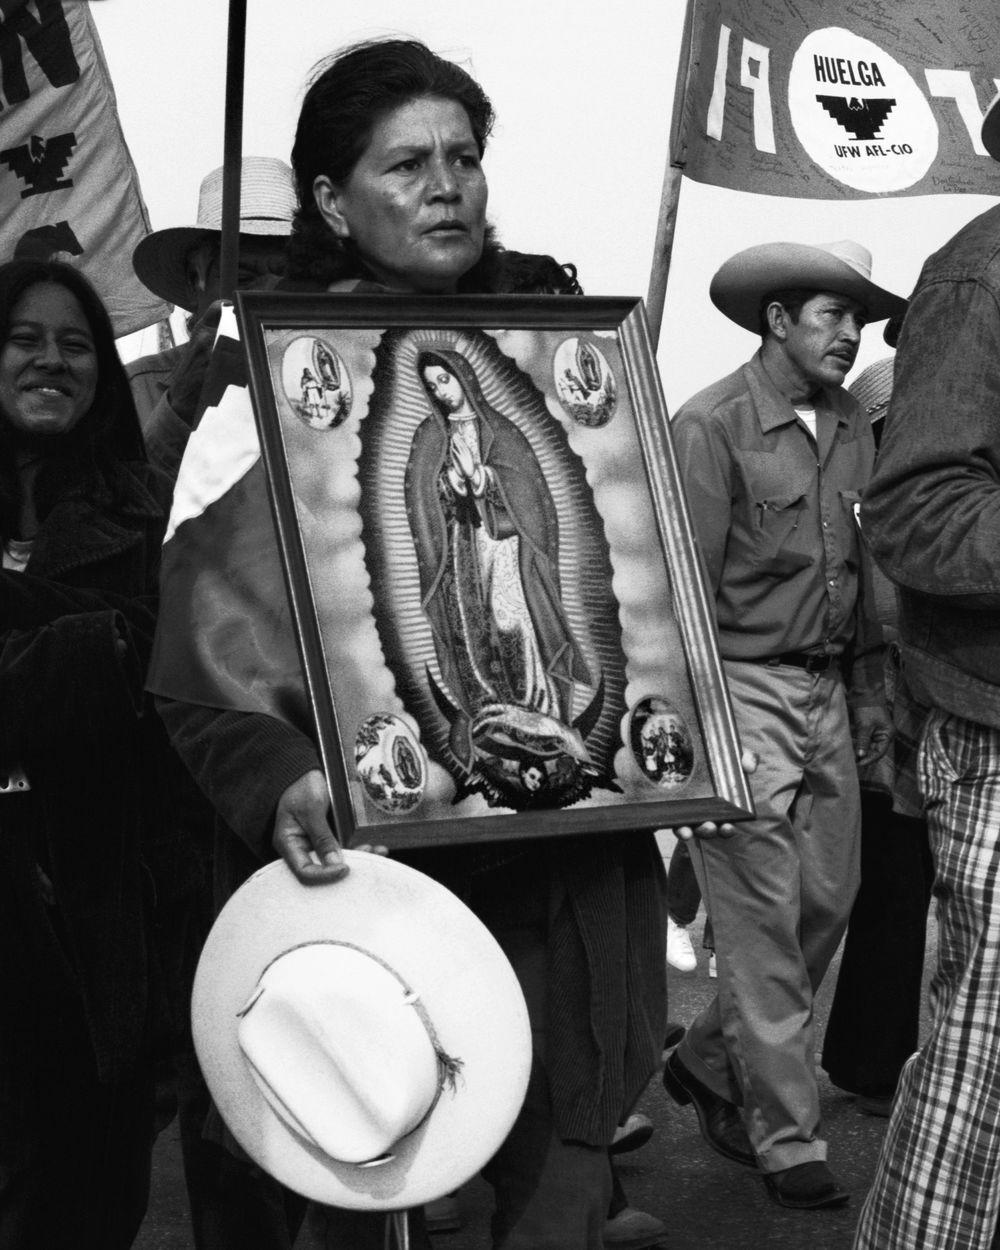 Jesus Garza - Marche avec la Vierge de Guadalupe, 1974